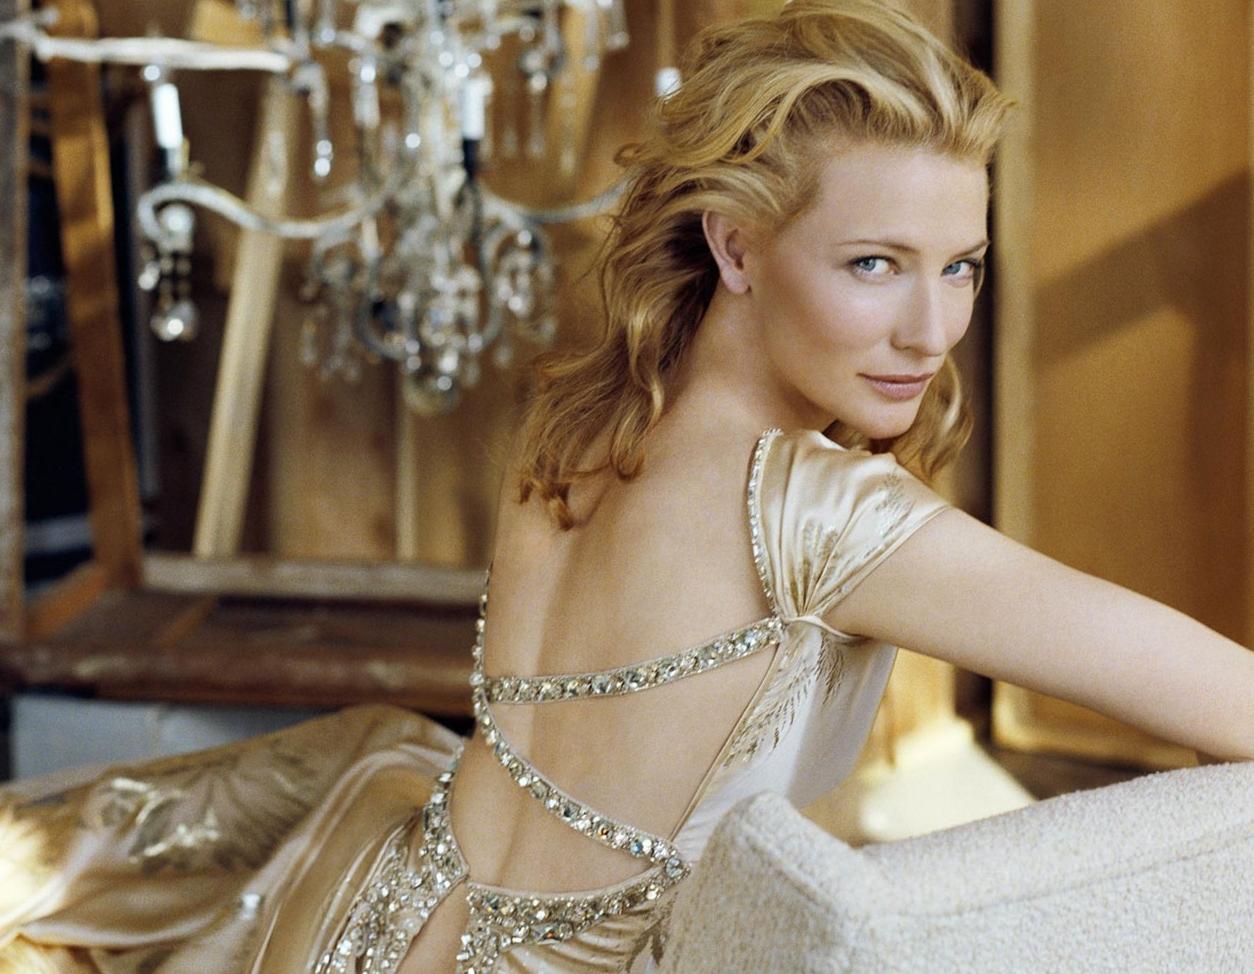 CateBlanchett3 jpg Cate Blanchett